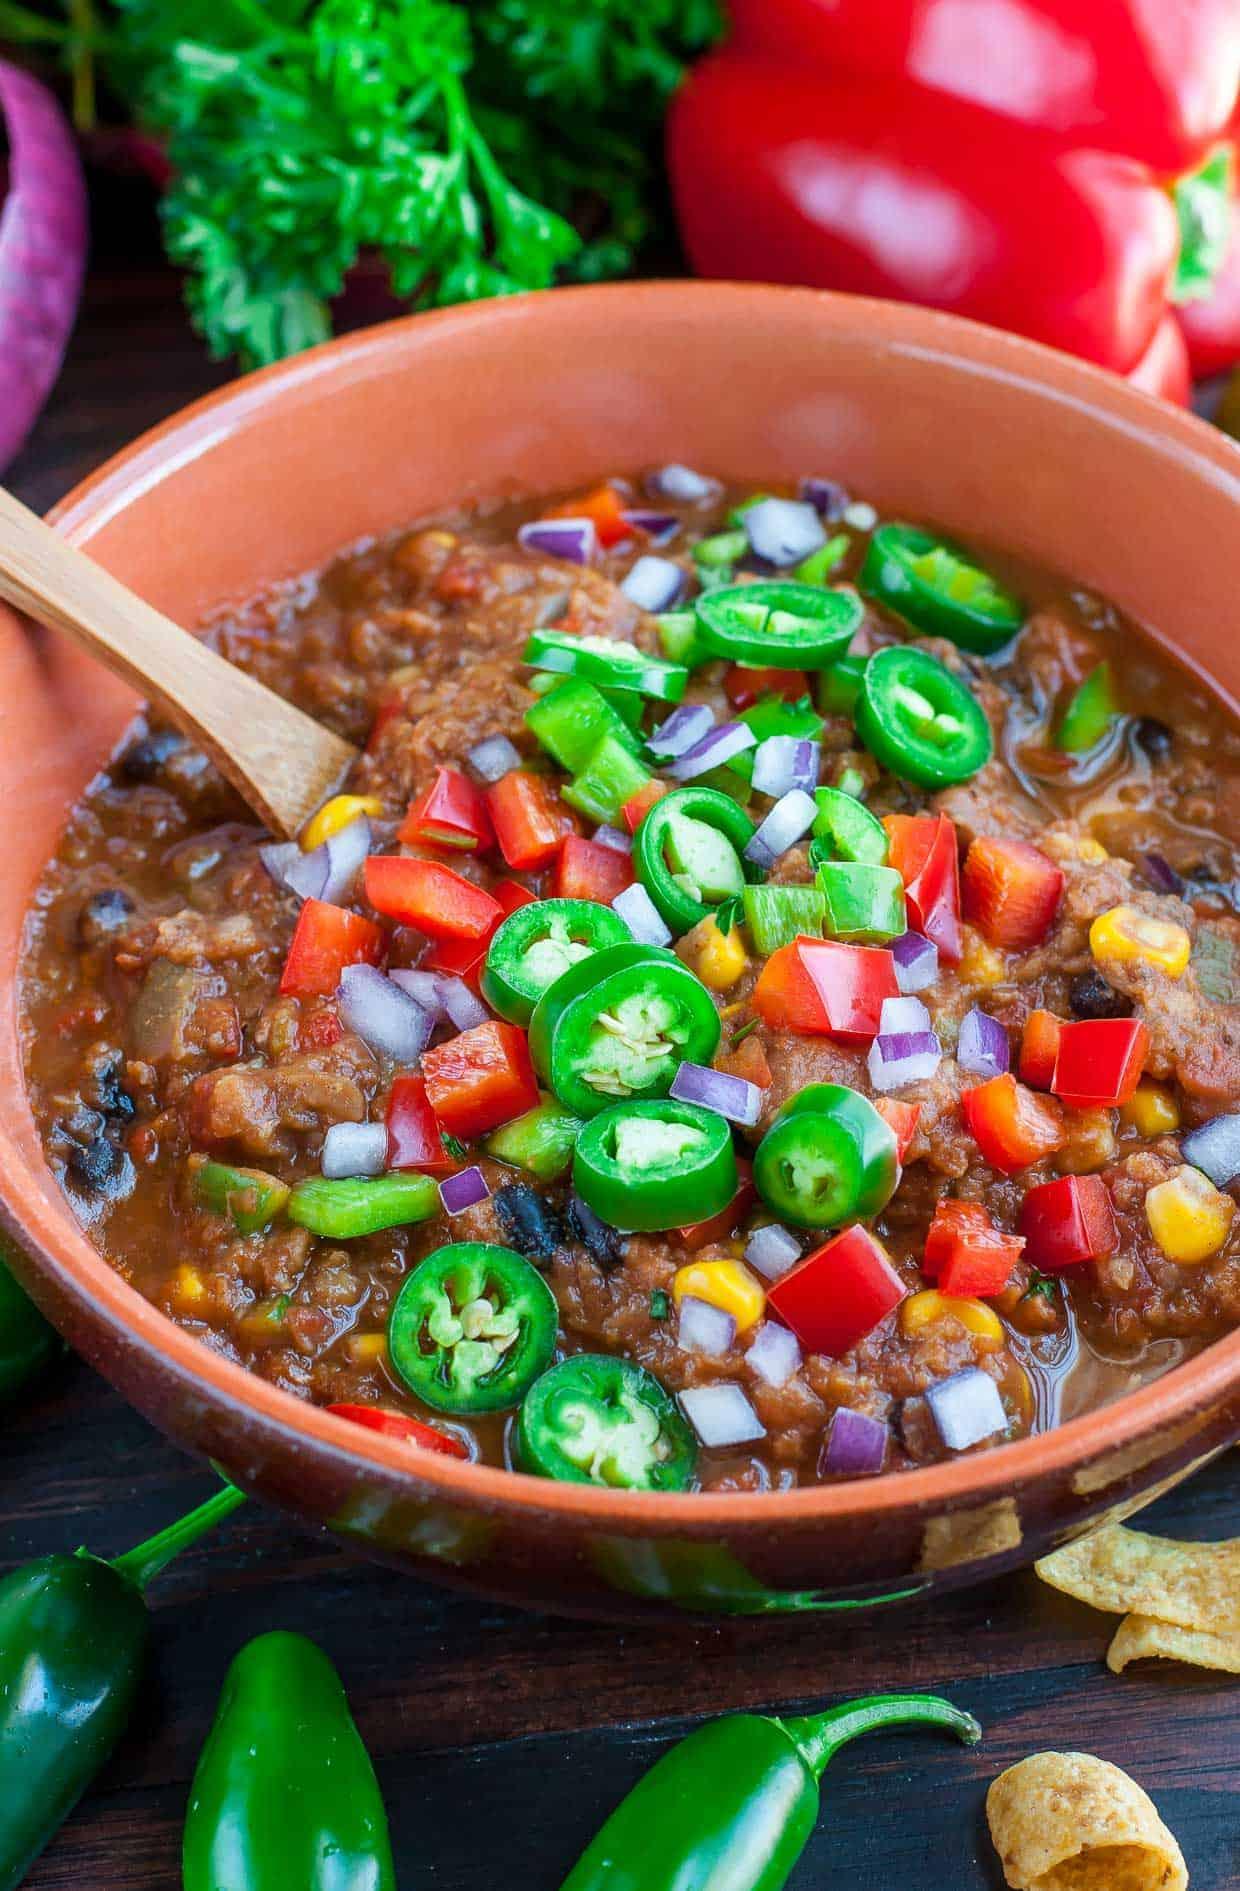 easy-healthy-vegan-red-lentil-chili-recipe-peasandcrayons-1958